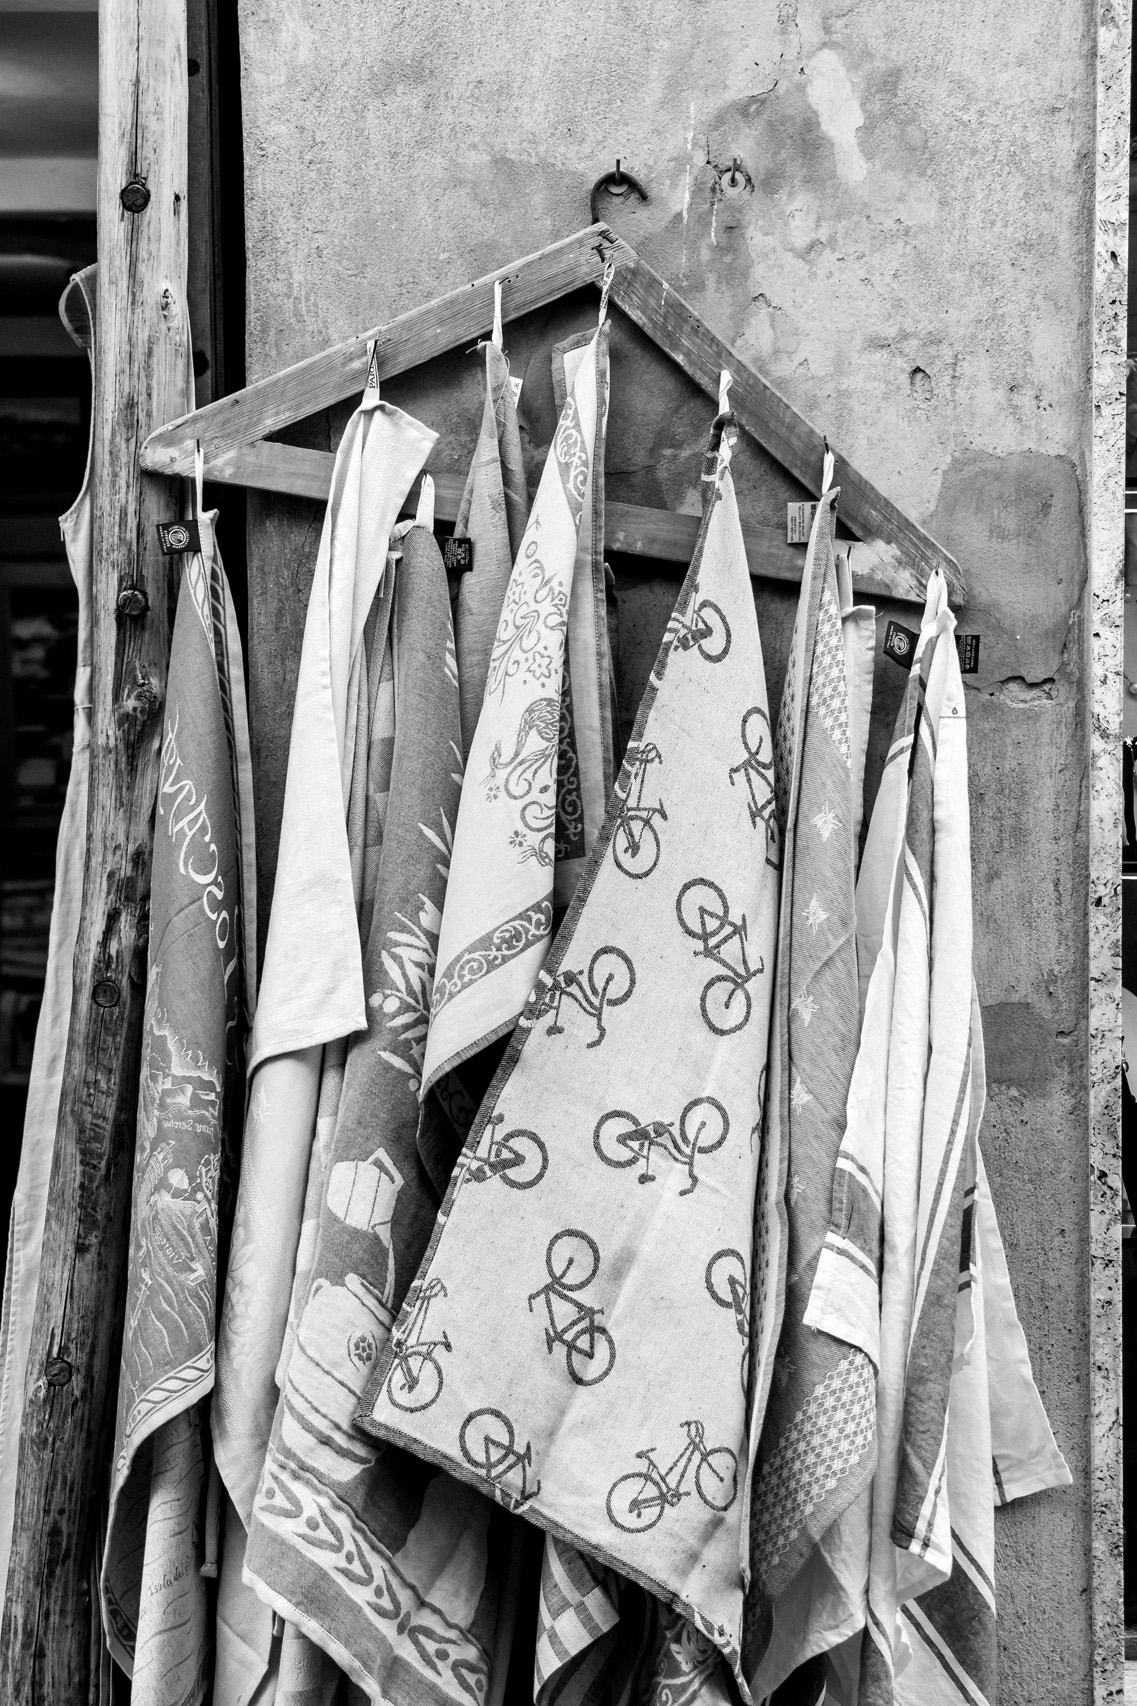 Linen shopping in Pienza, Tuscany